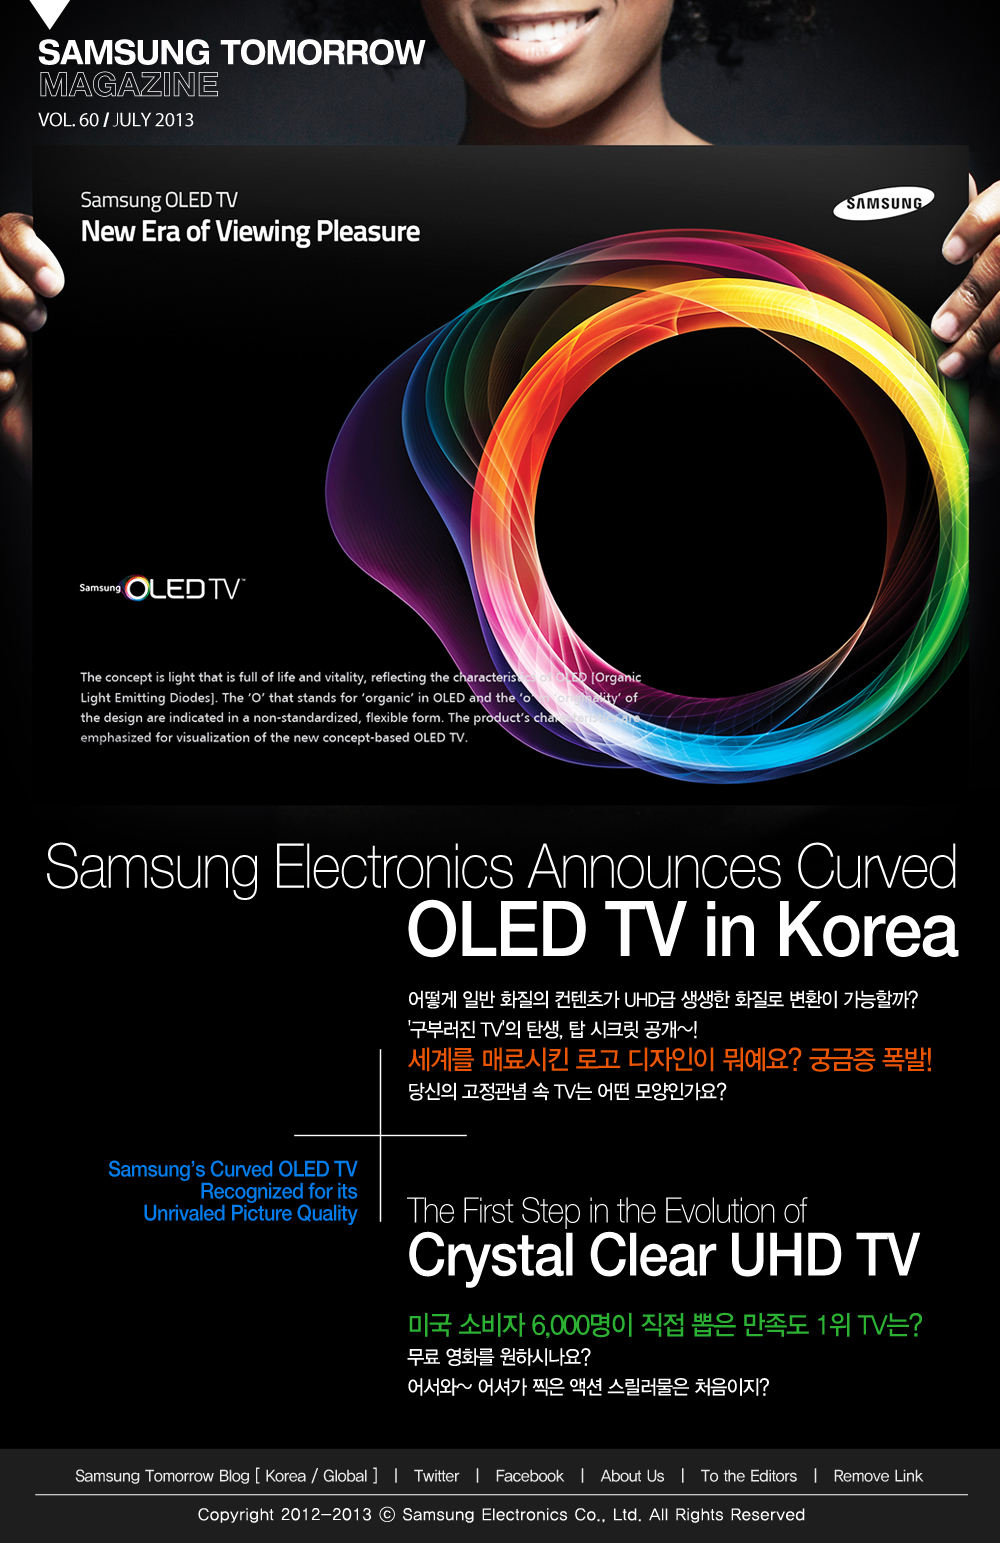 SAMSUNG TOMORROW MAGAZINE VOL. 60 / JULY 2013 Samsung Electronics Announces Curved OLED TV in Korea 어떻게 일반 화질의 컨텐츠가 UHD급 생생한 화질로 변환이 가능할까? '구부러진 TV'의 탄생, 탑 시크릿 공개~! 세계를 매료시킨 로고 디자인이 뭐예요? 궁금증 폭발! 당신의 고정관념 속 TV는 어떤 모양인가요? Samsung's Curved OLED TV Recognized for its Unrivaled Picture Quality The First Step in the Evolution of Crystal Clear UHD TV 미국 소비자 6,000명이 직접 뽑은 만족도 1위 TV는? 무료 영화를 원하시나요? 어서와~ 어셔가 찍은 액션 스릴러물은 처음이지?